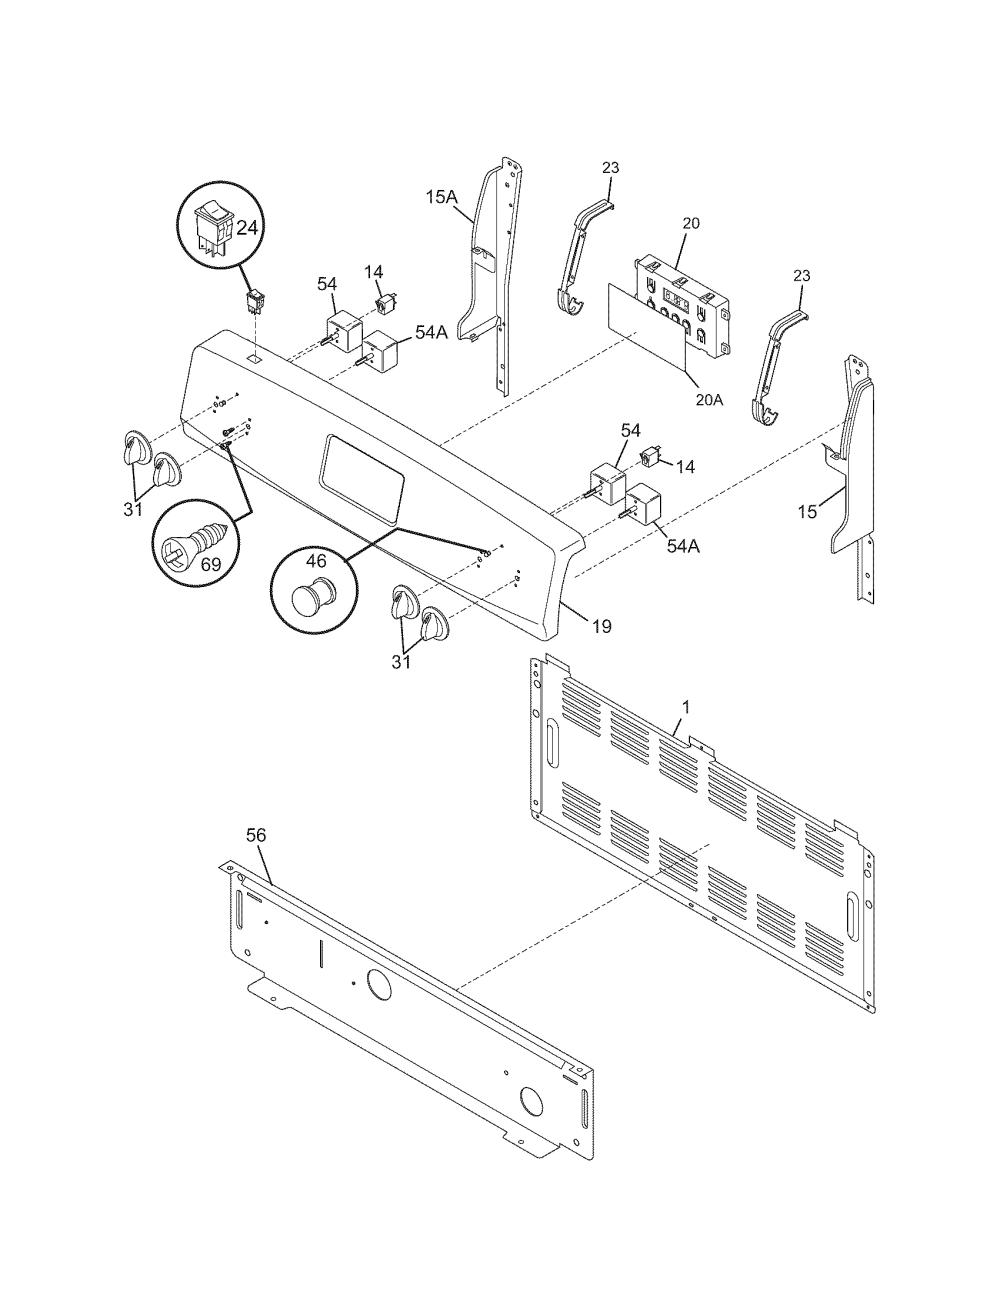 medium resolution of 79095042503 electric range backguard parts diagram